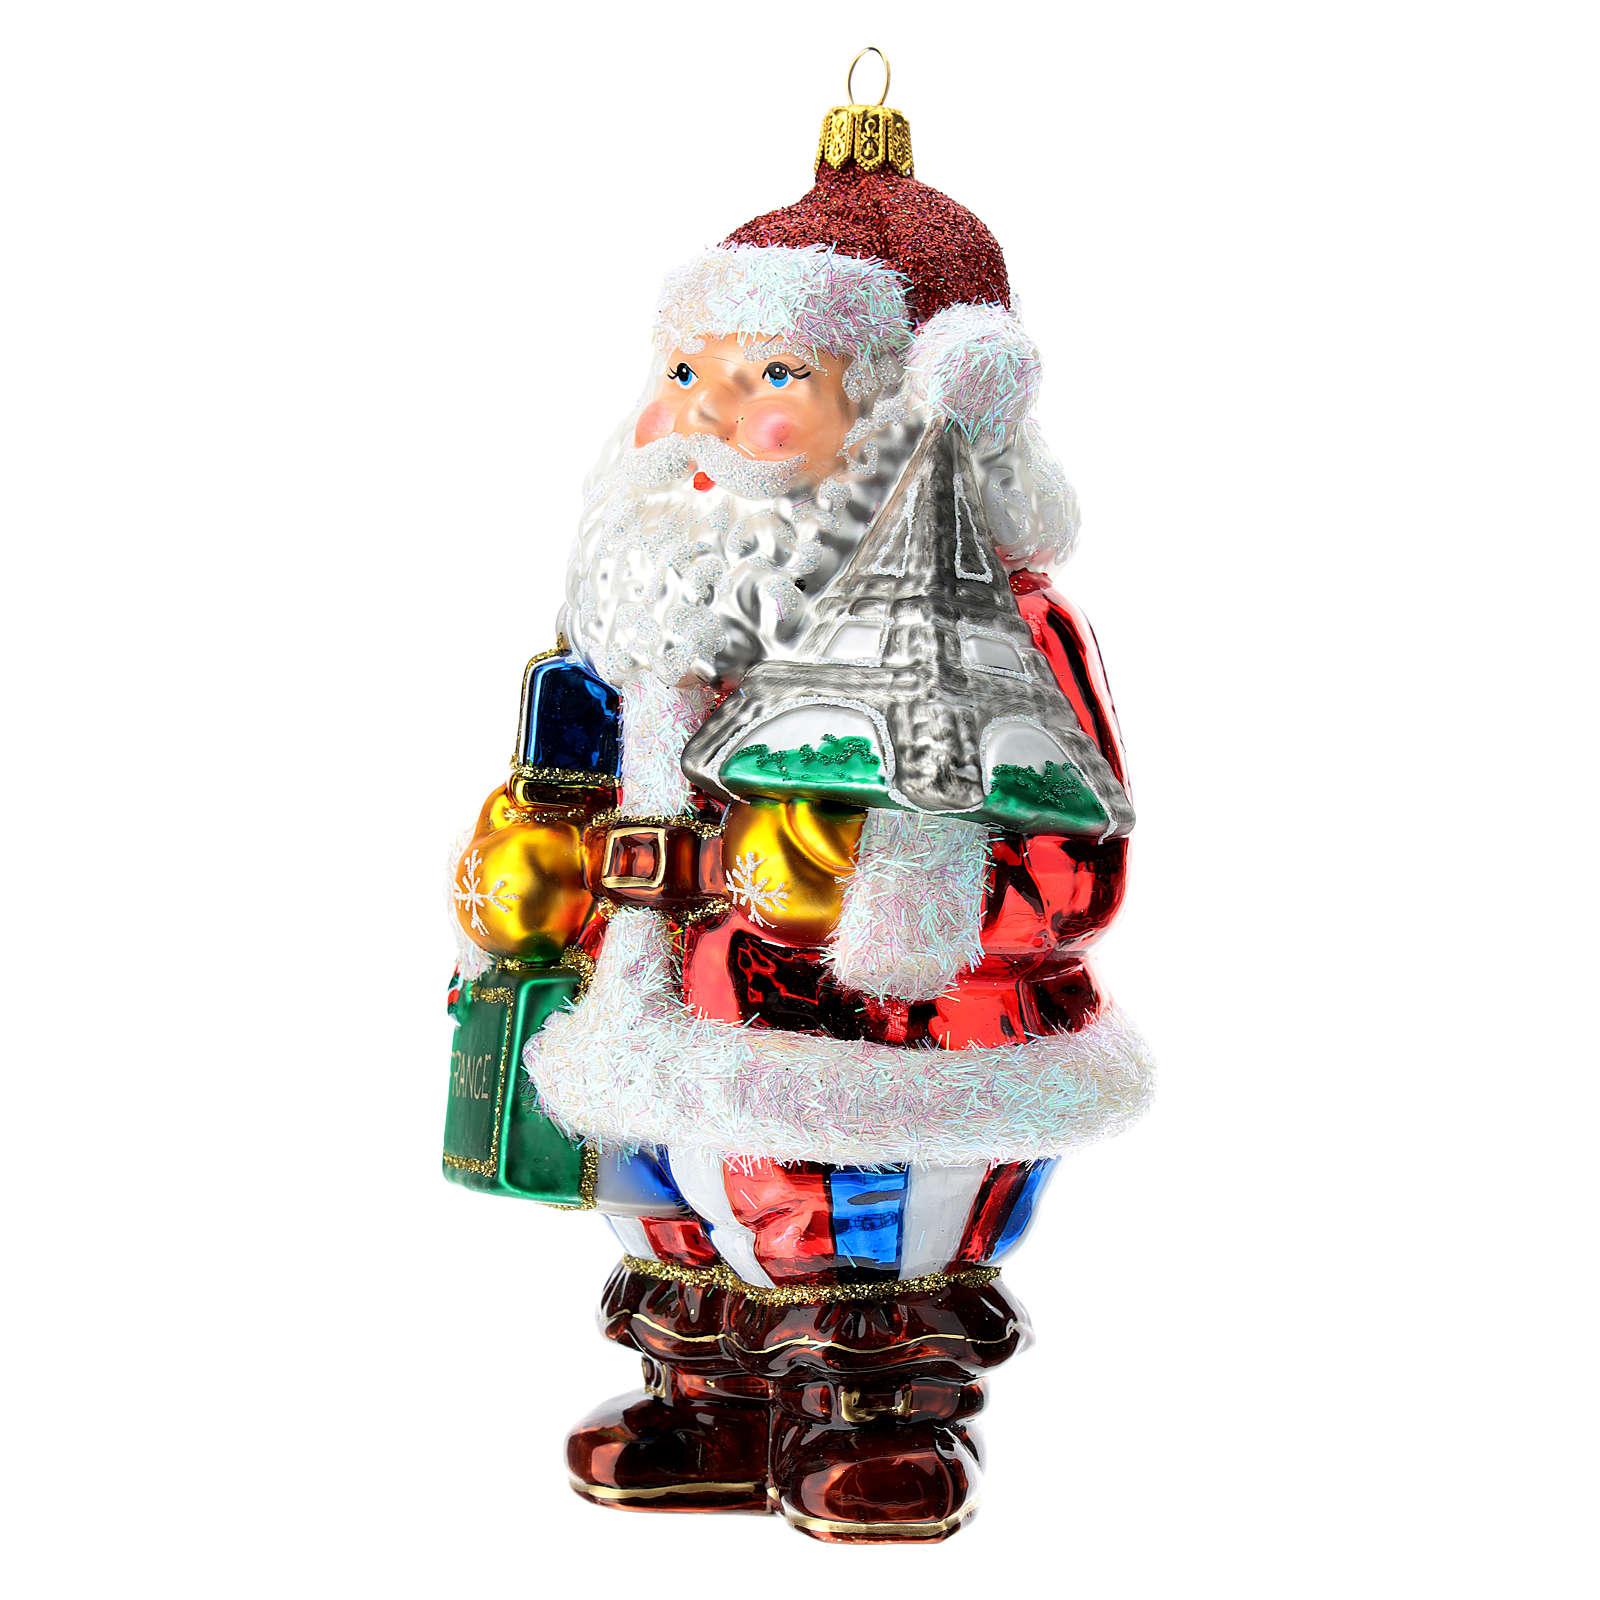 Blown glass Christmas ornament, Santa Claus in France 4